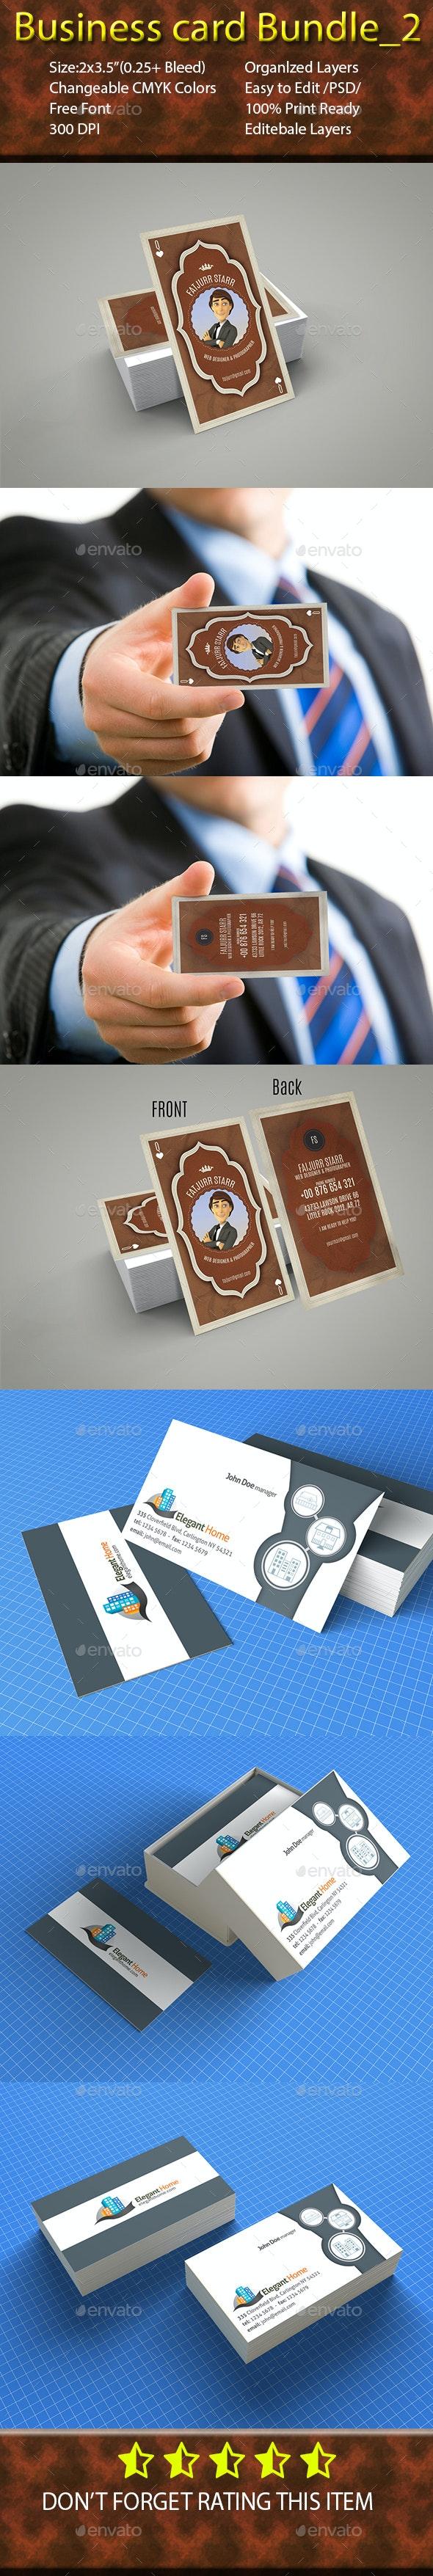 Business card Bundle_2 - Corporate Business Cards